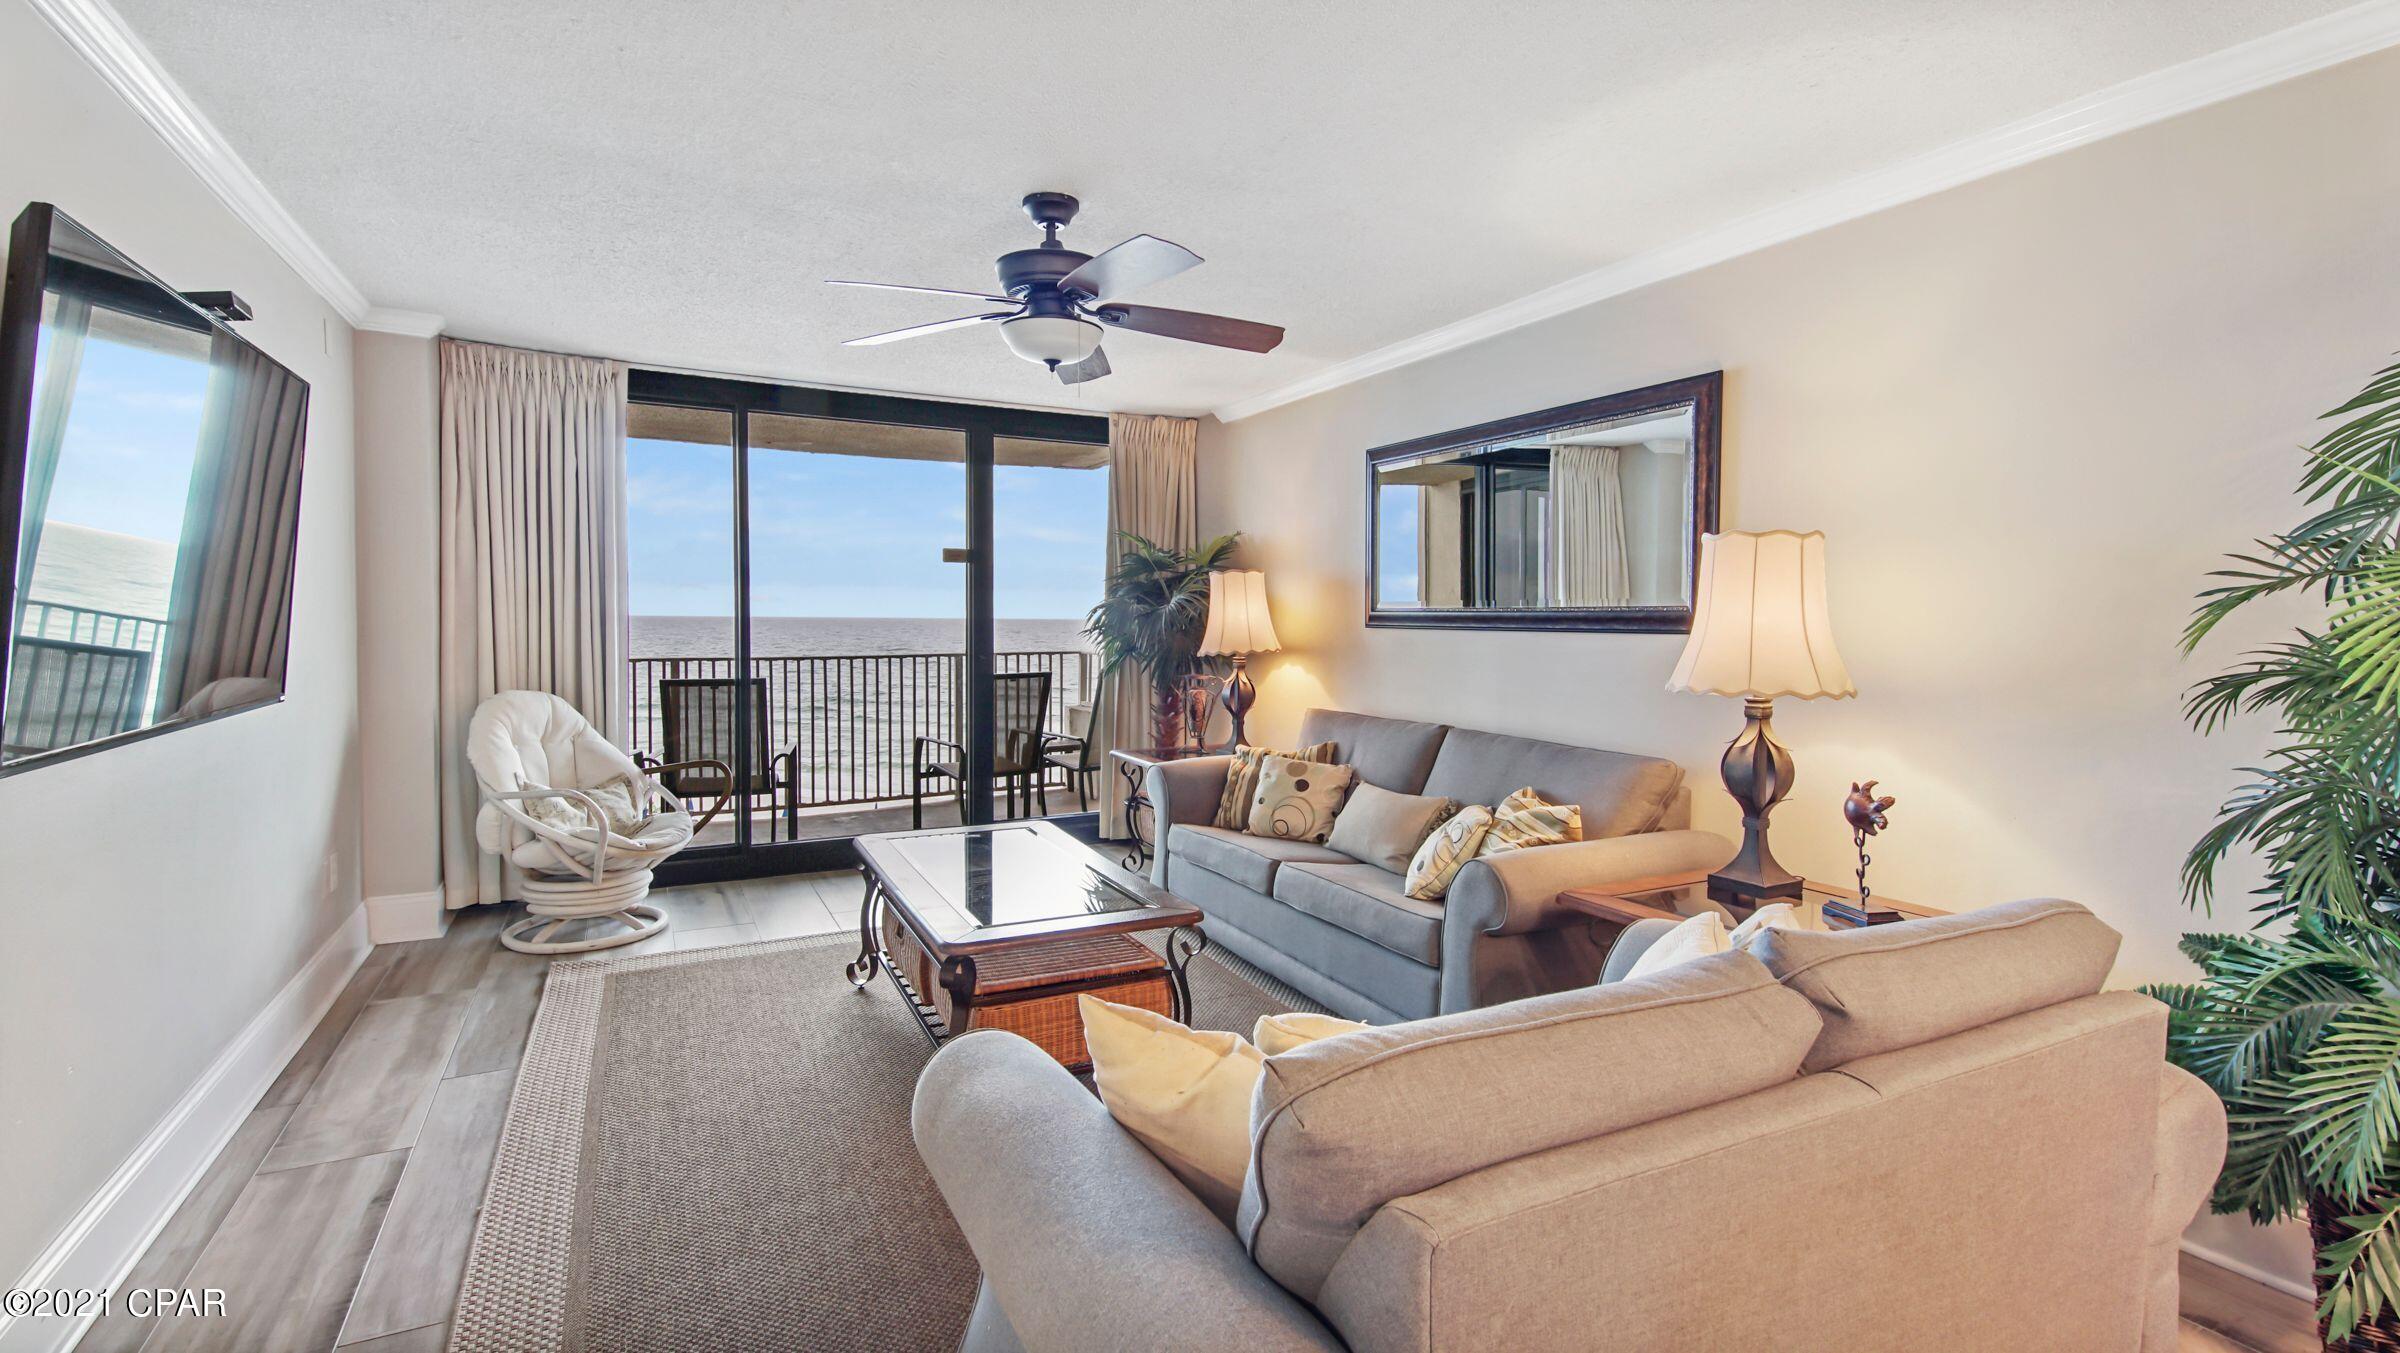 A 2 Bedroom 2 Bedroom Dunes Of Panama Phase I Condominium